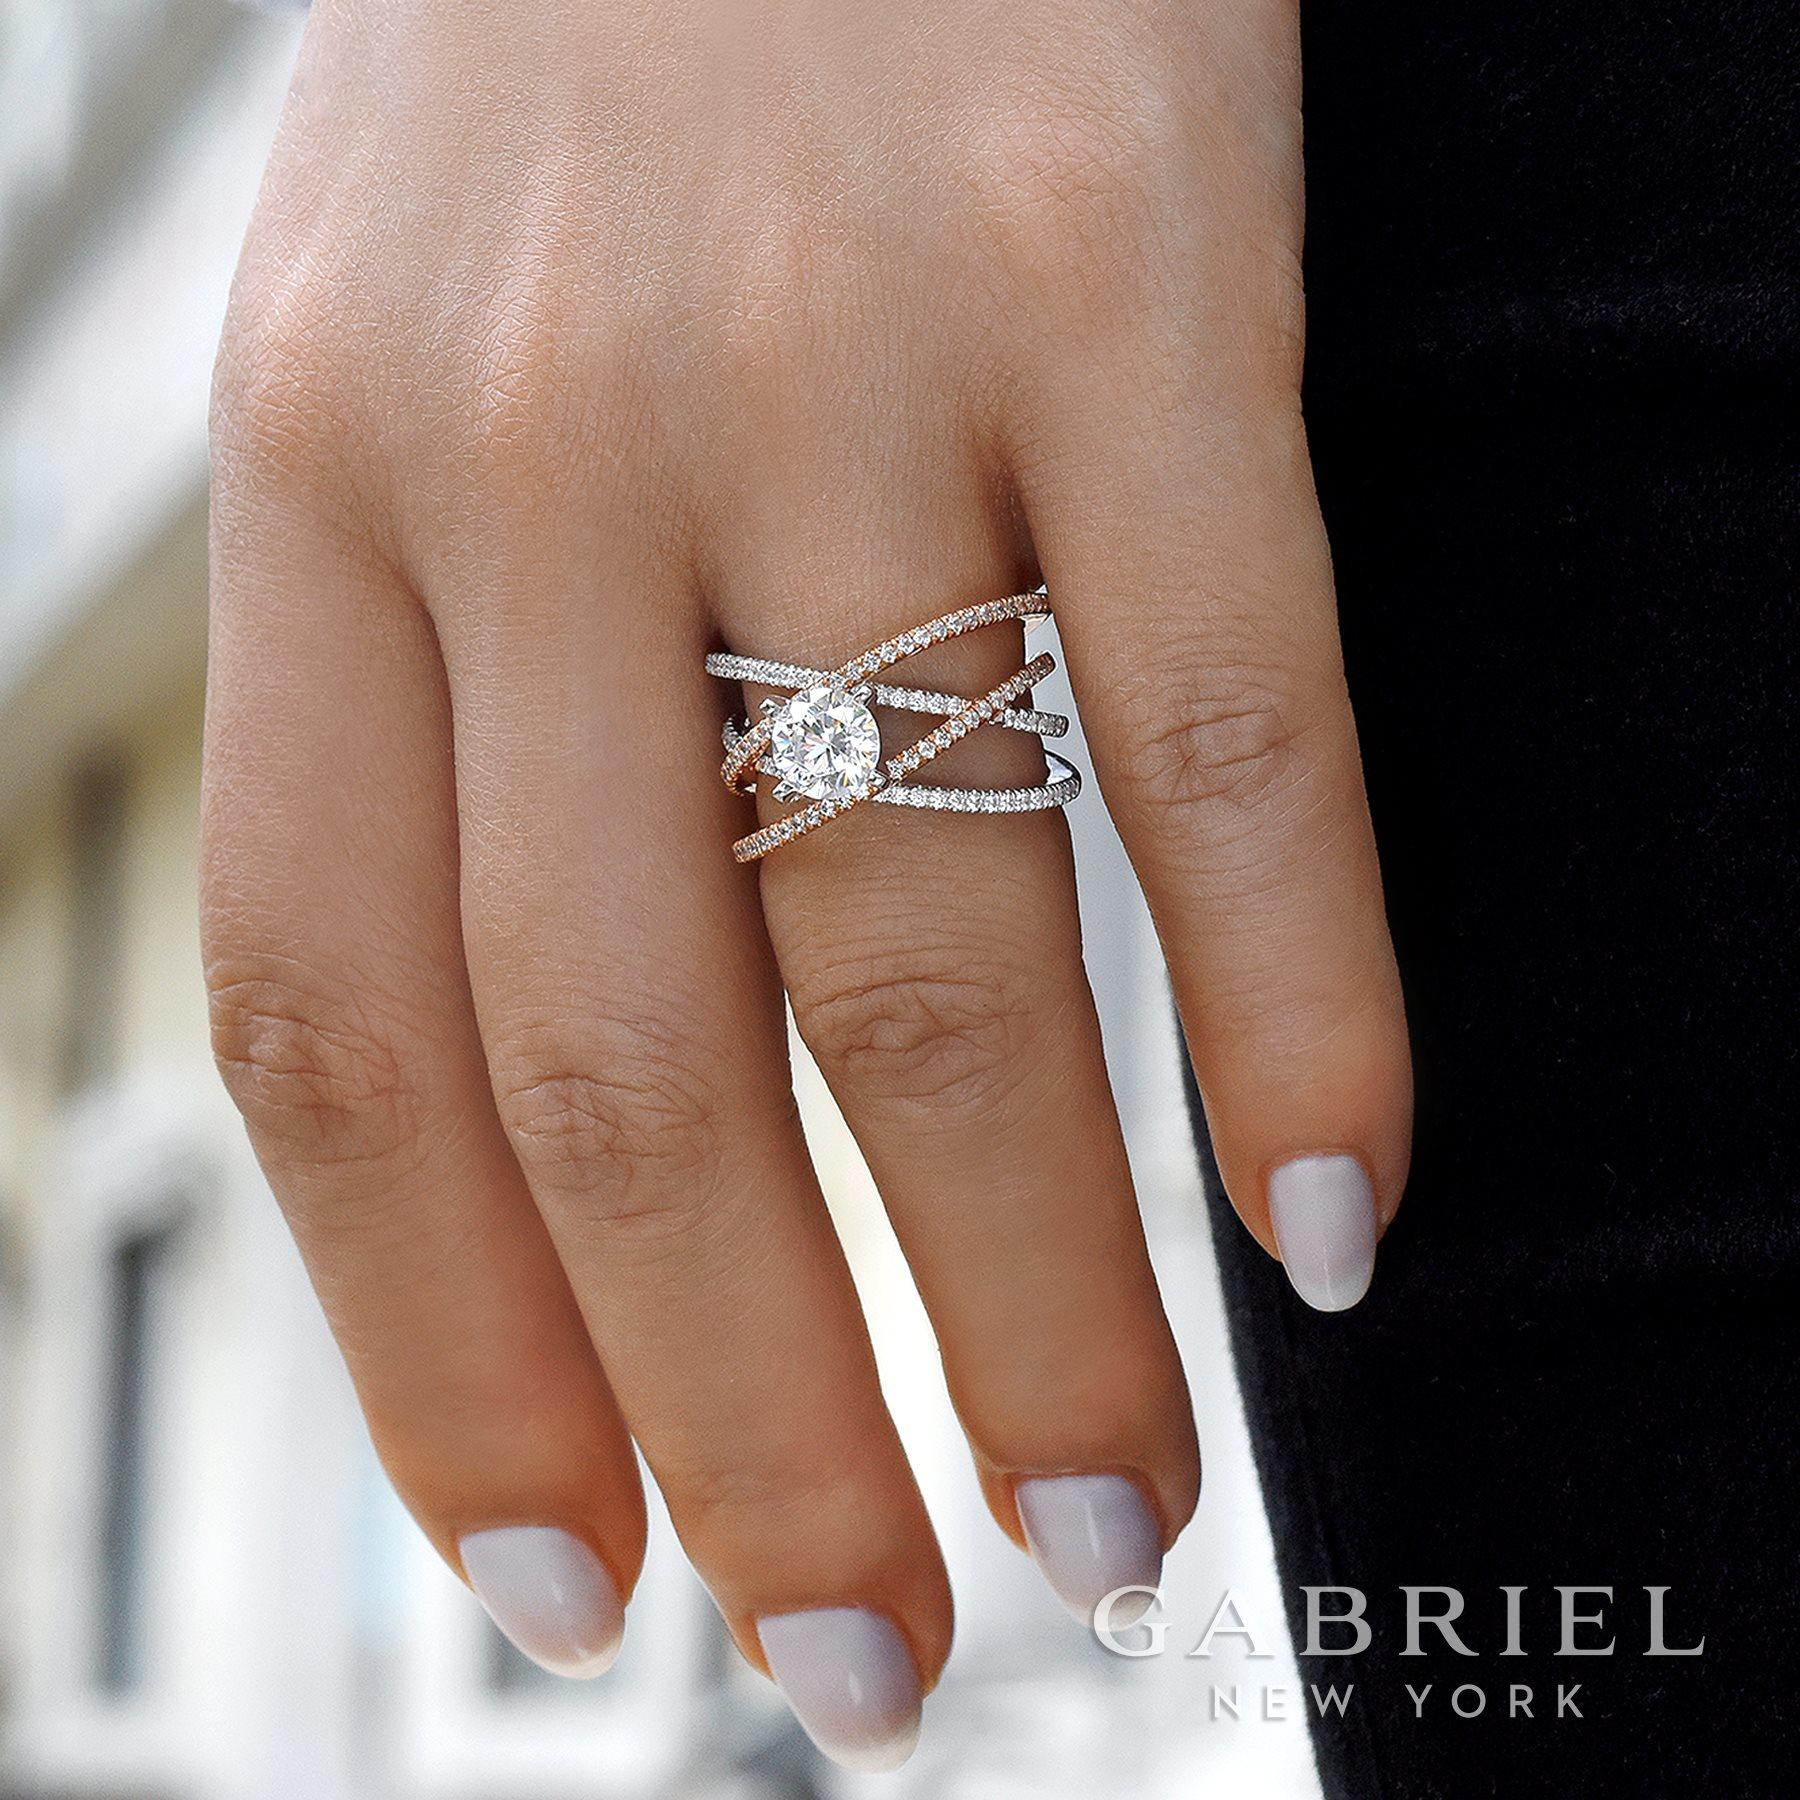 Emerald Lady Jewelry image 90